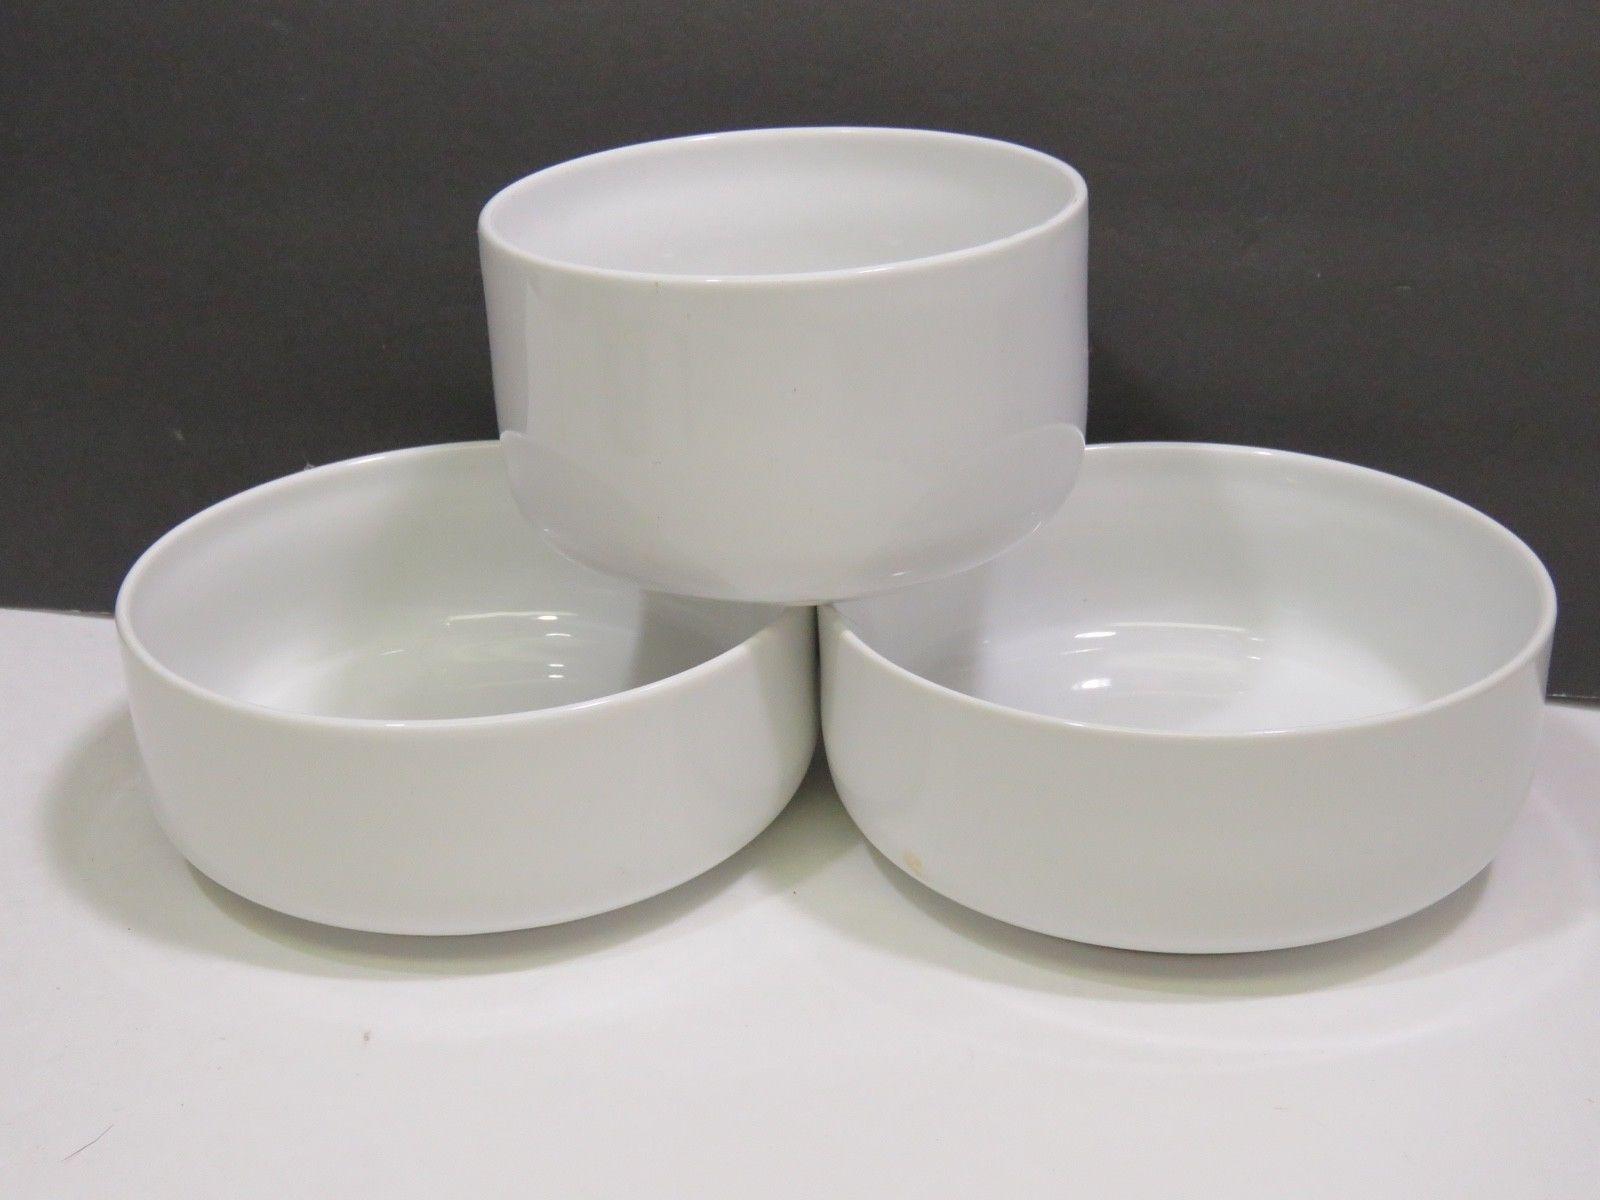 3 Dansk International Designs Japan White Bowls 2 Sizes Mid Century Modern  - $31.68